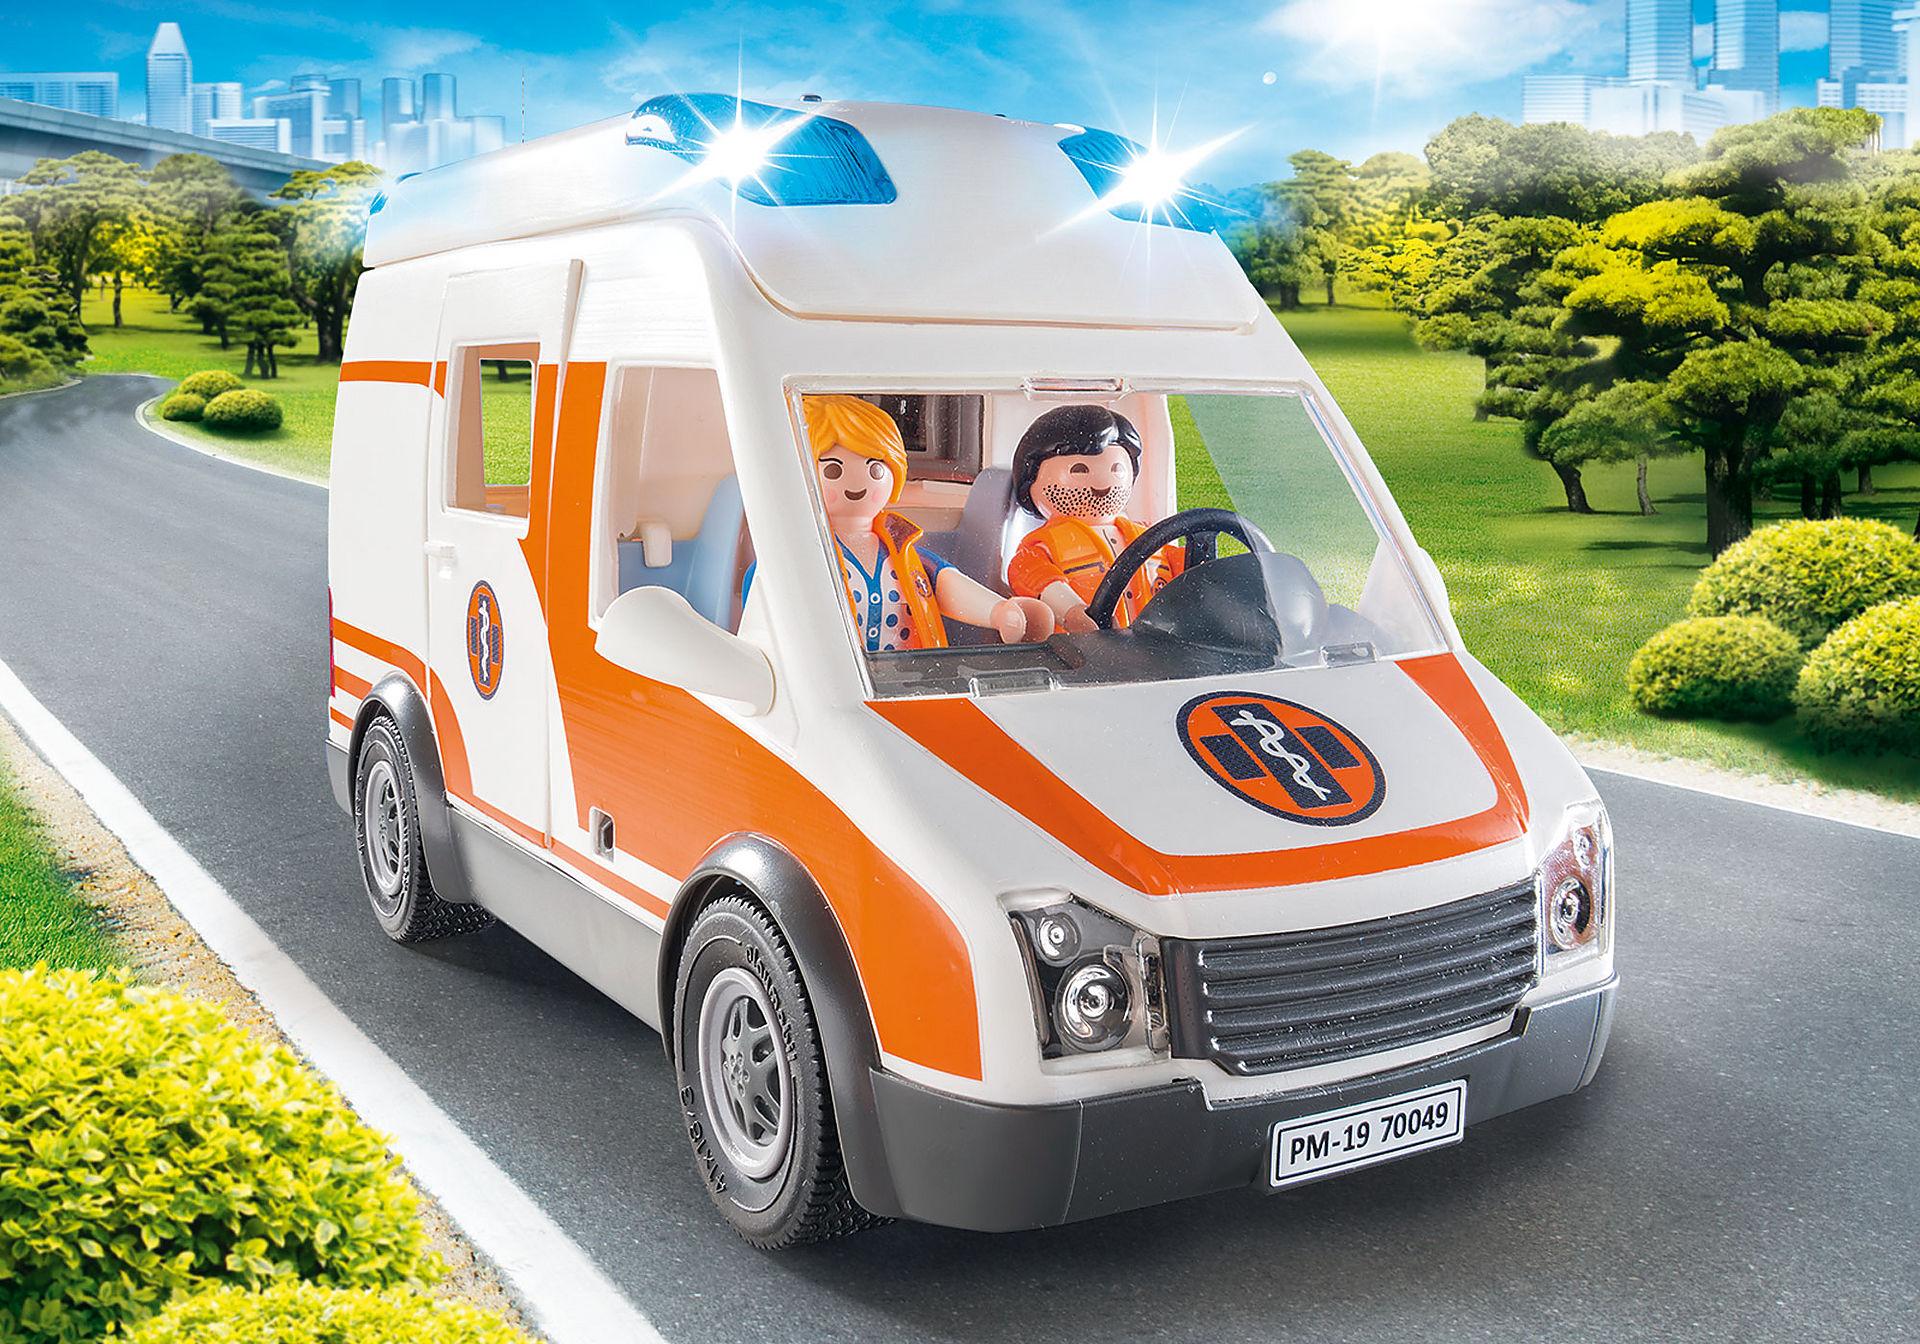 70049 Ambulance with Flashing Lights zoom image4